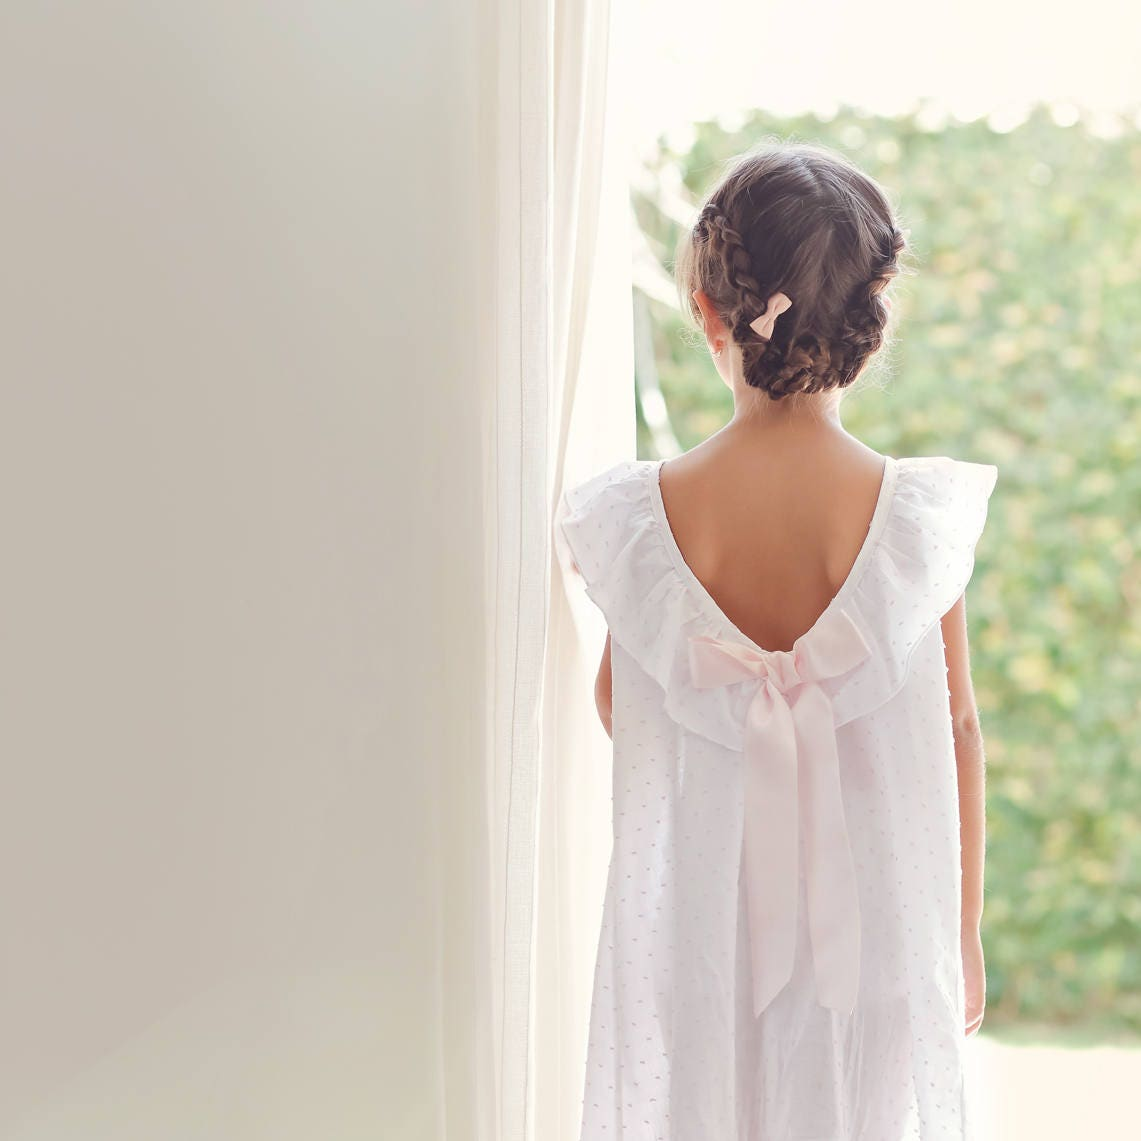 Girls Nightgowns . Girls Pajamas . Sophisticated Sleepwear . | Etsy